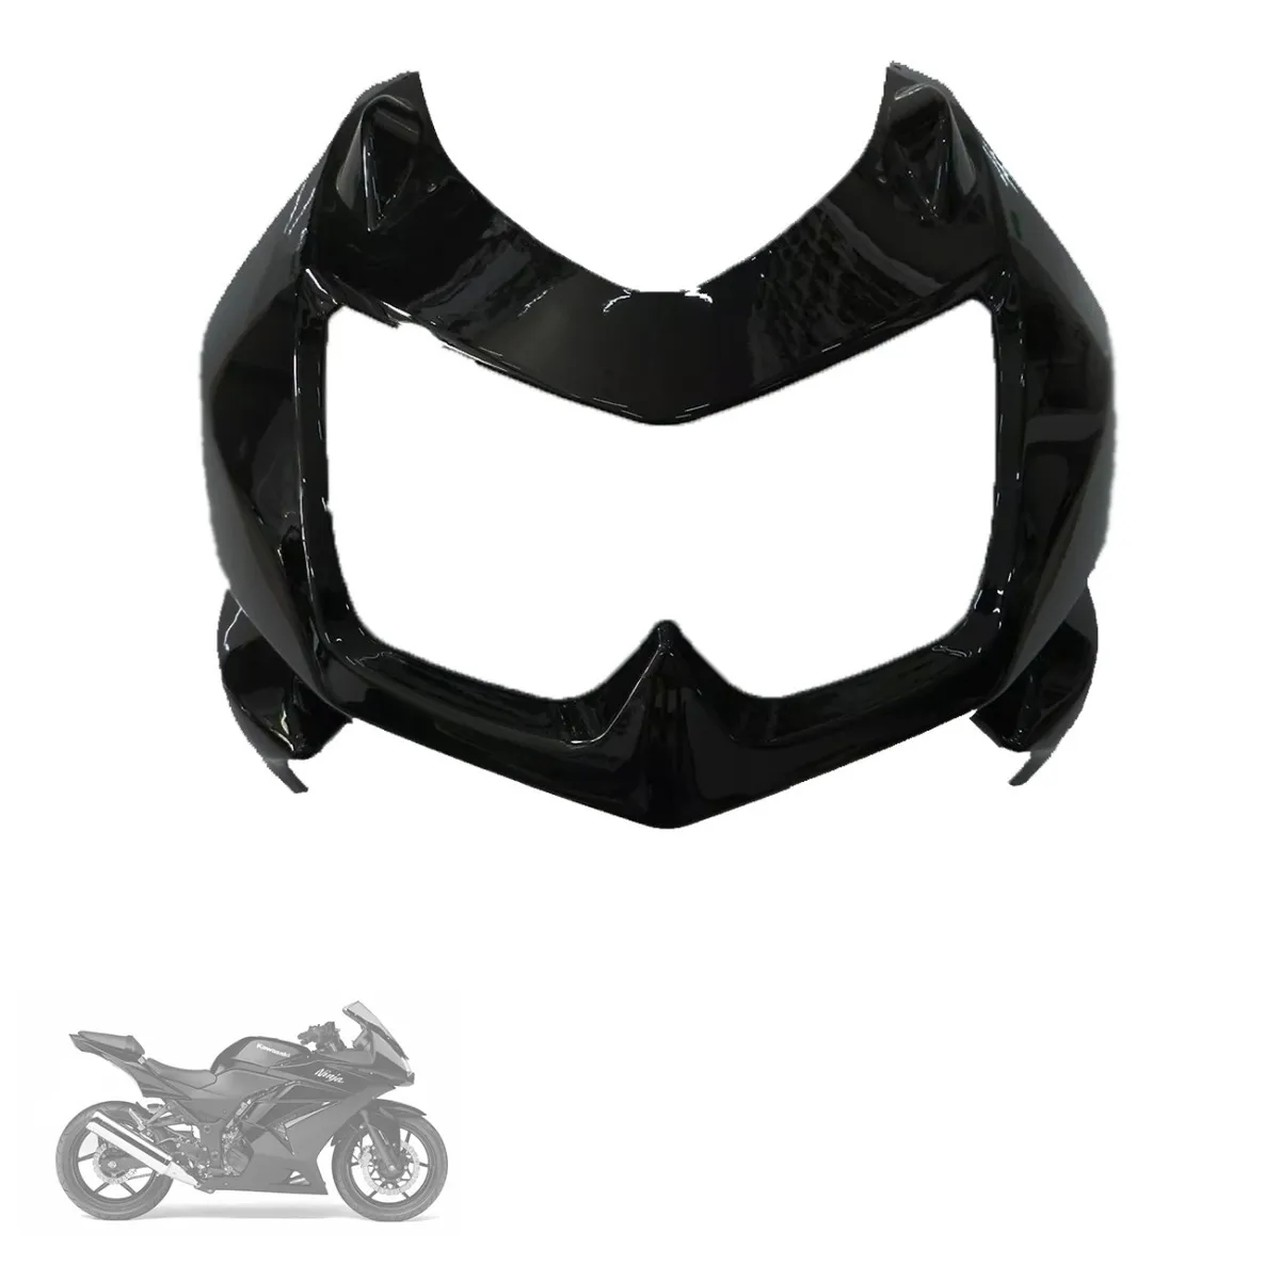 Carenagem Frontal | Ninja 250